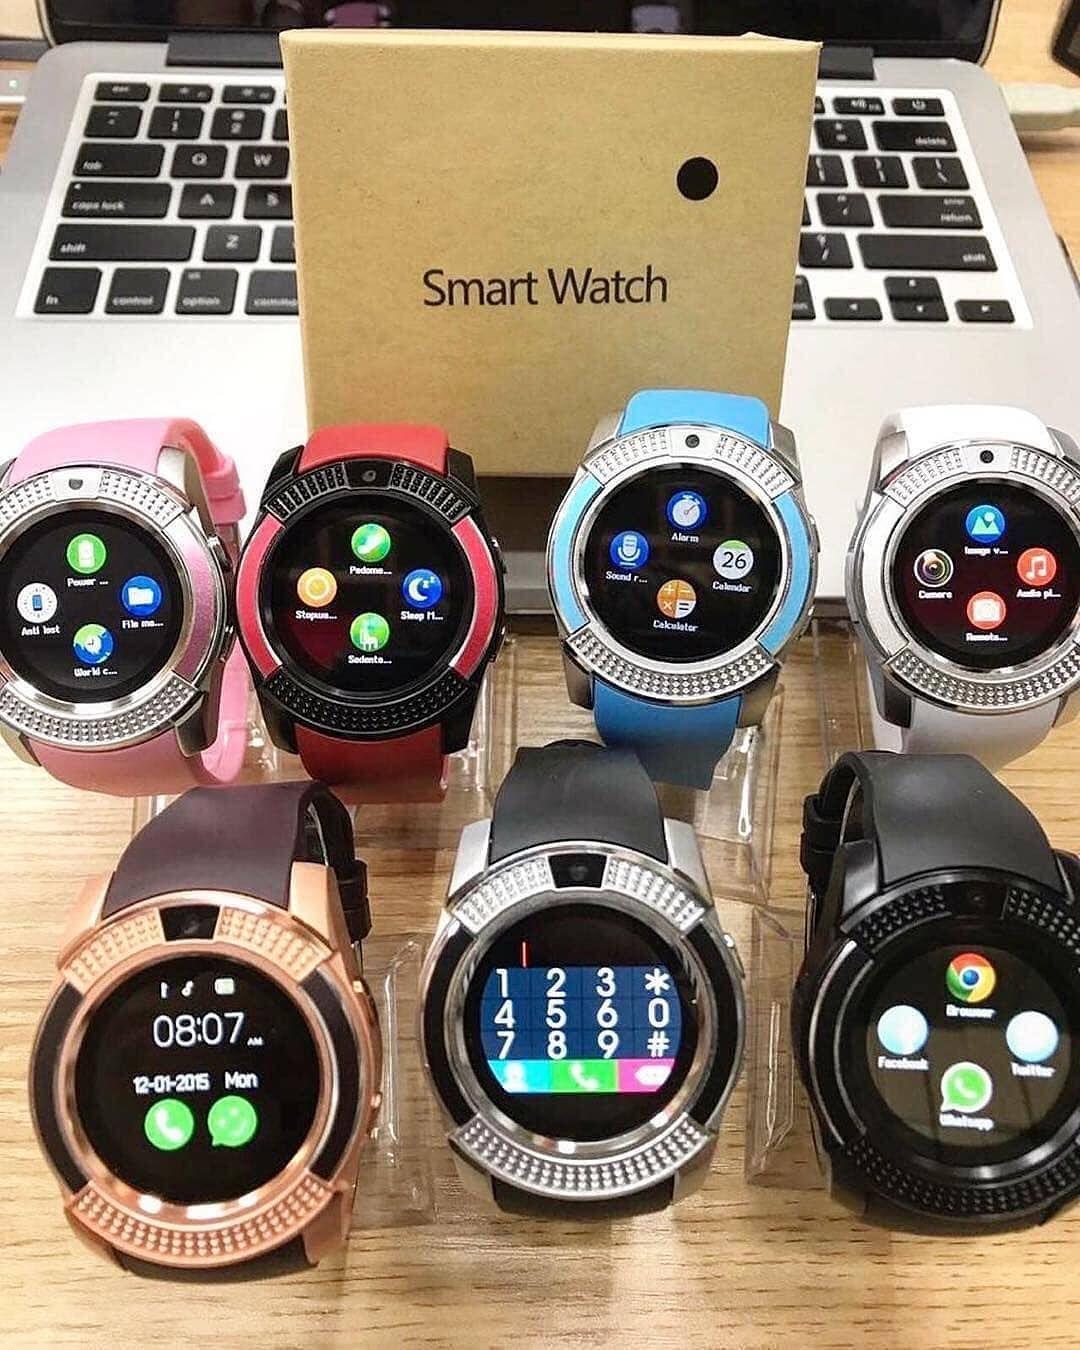 Harga : Rp 185 000 Harga : Rp 185 000   Smart Watch V8